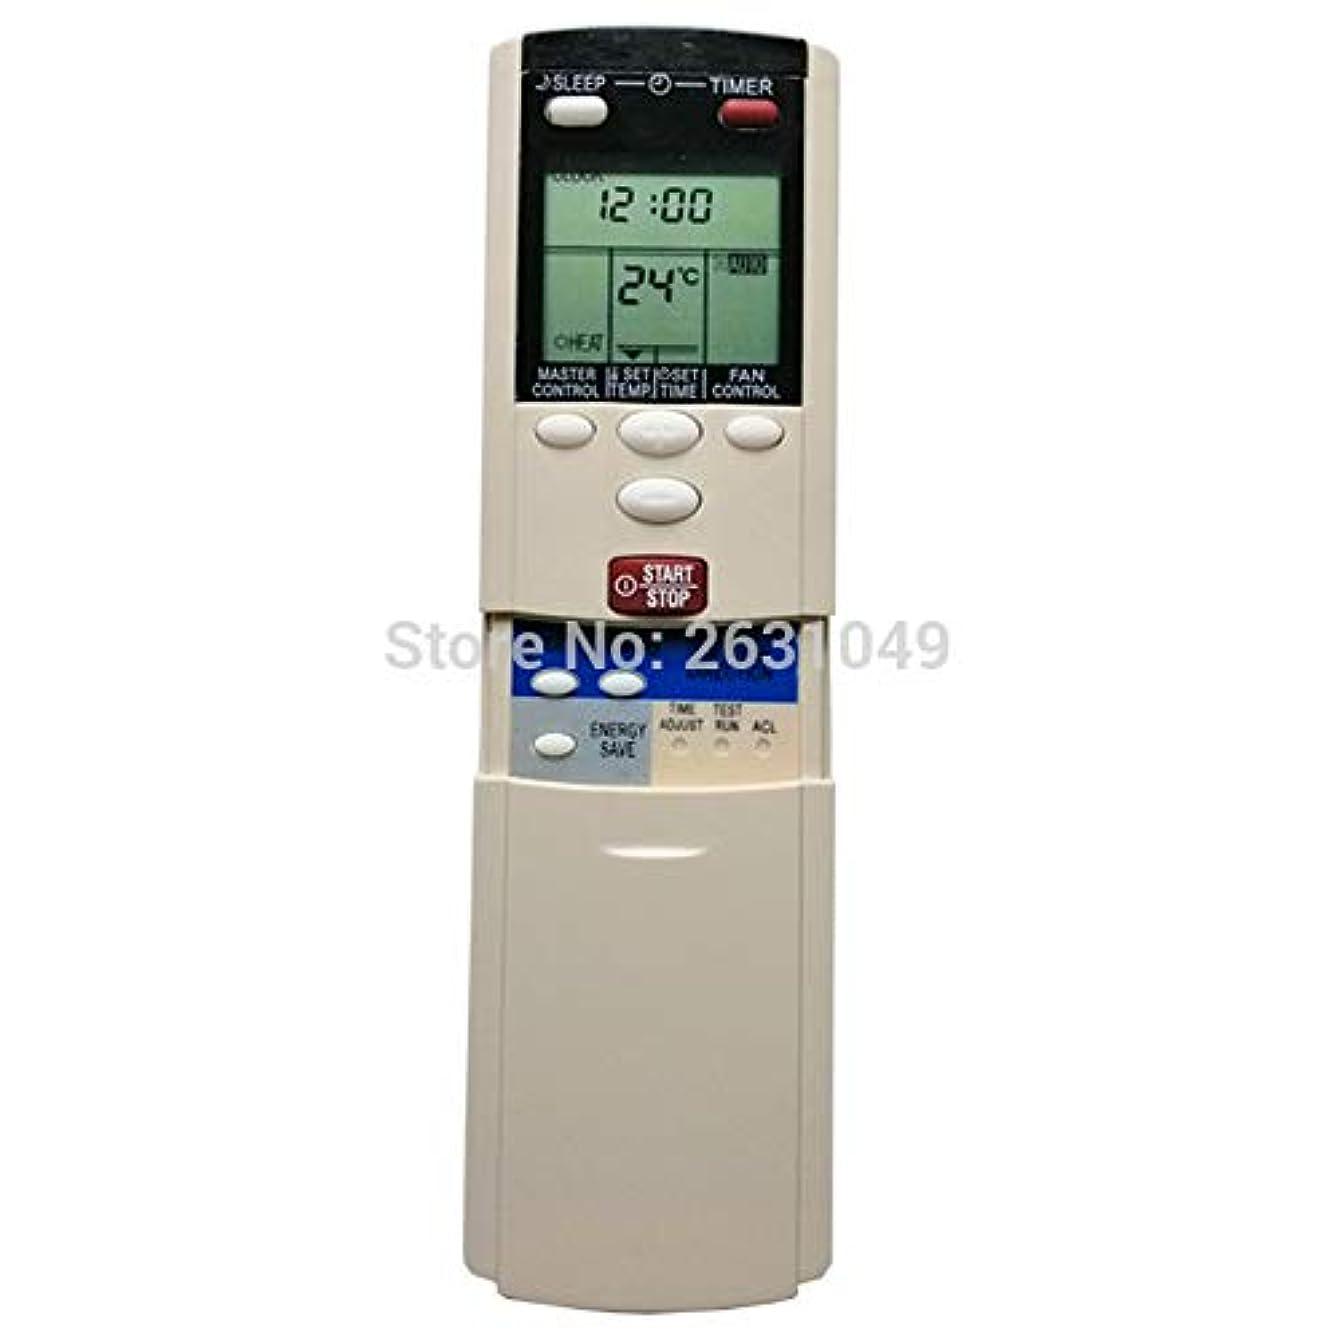 Calvas Replacement Remote for Fujitsu Air Conditioner Remote Control Model AR-DL5 AR-DL7 AR-DL8 AR-DL9 AR-DL11 AR-DL12 AR-DL13